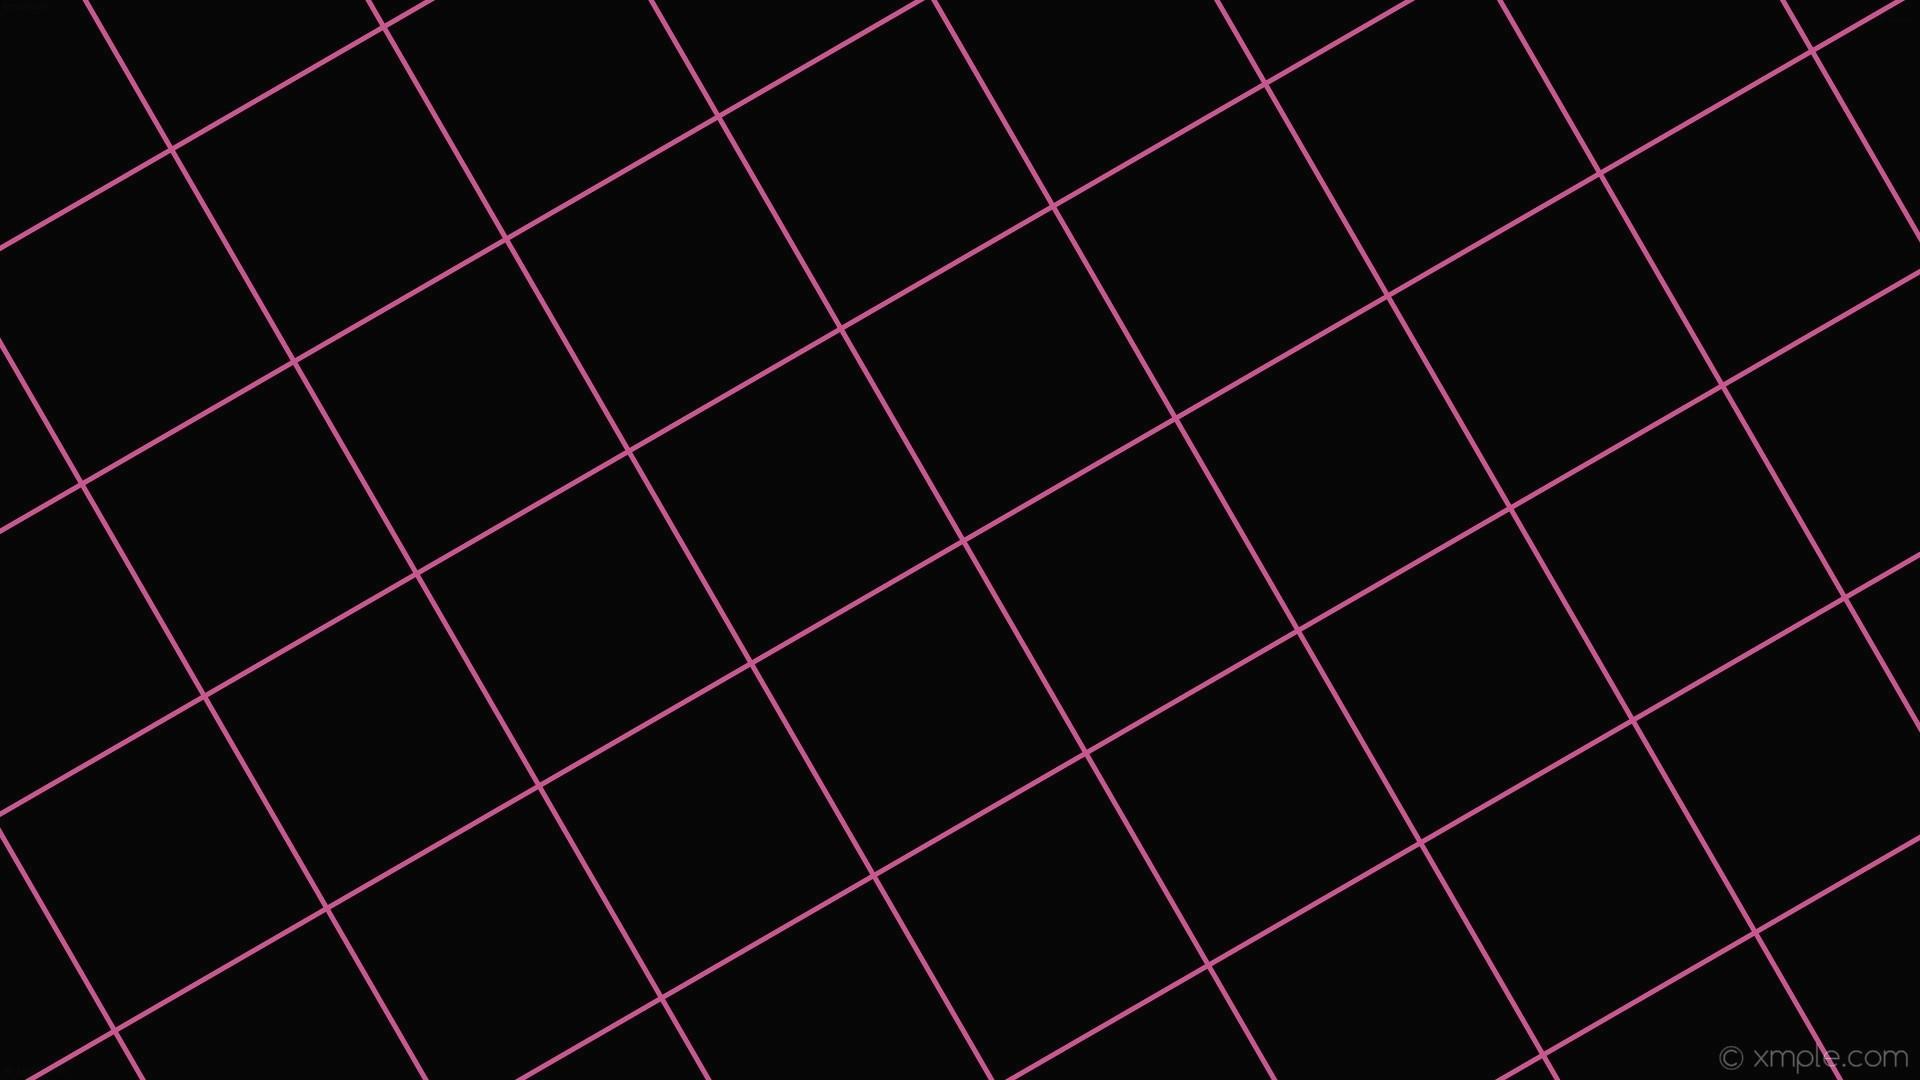 Res: 1920x1080, iPhone Wallpaper Black Pink Fresh Black Grid Wallpaper 75 Images Of iPhone Wallpaper  Black Pink Lovely